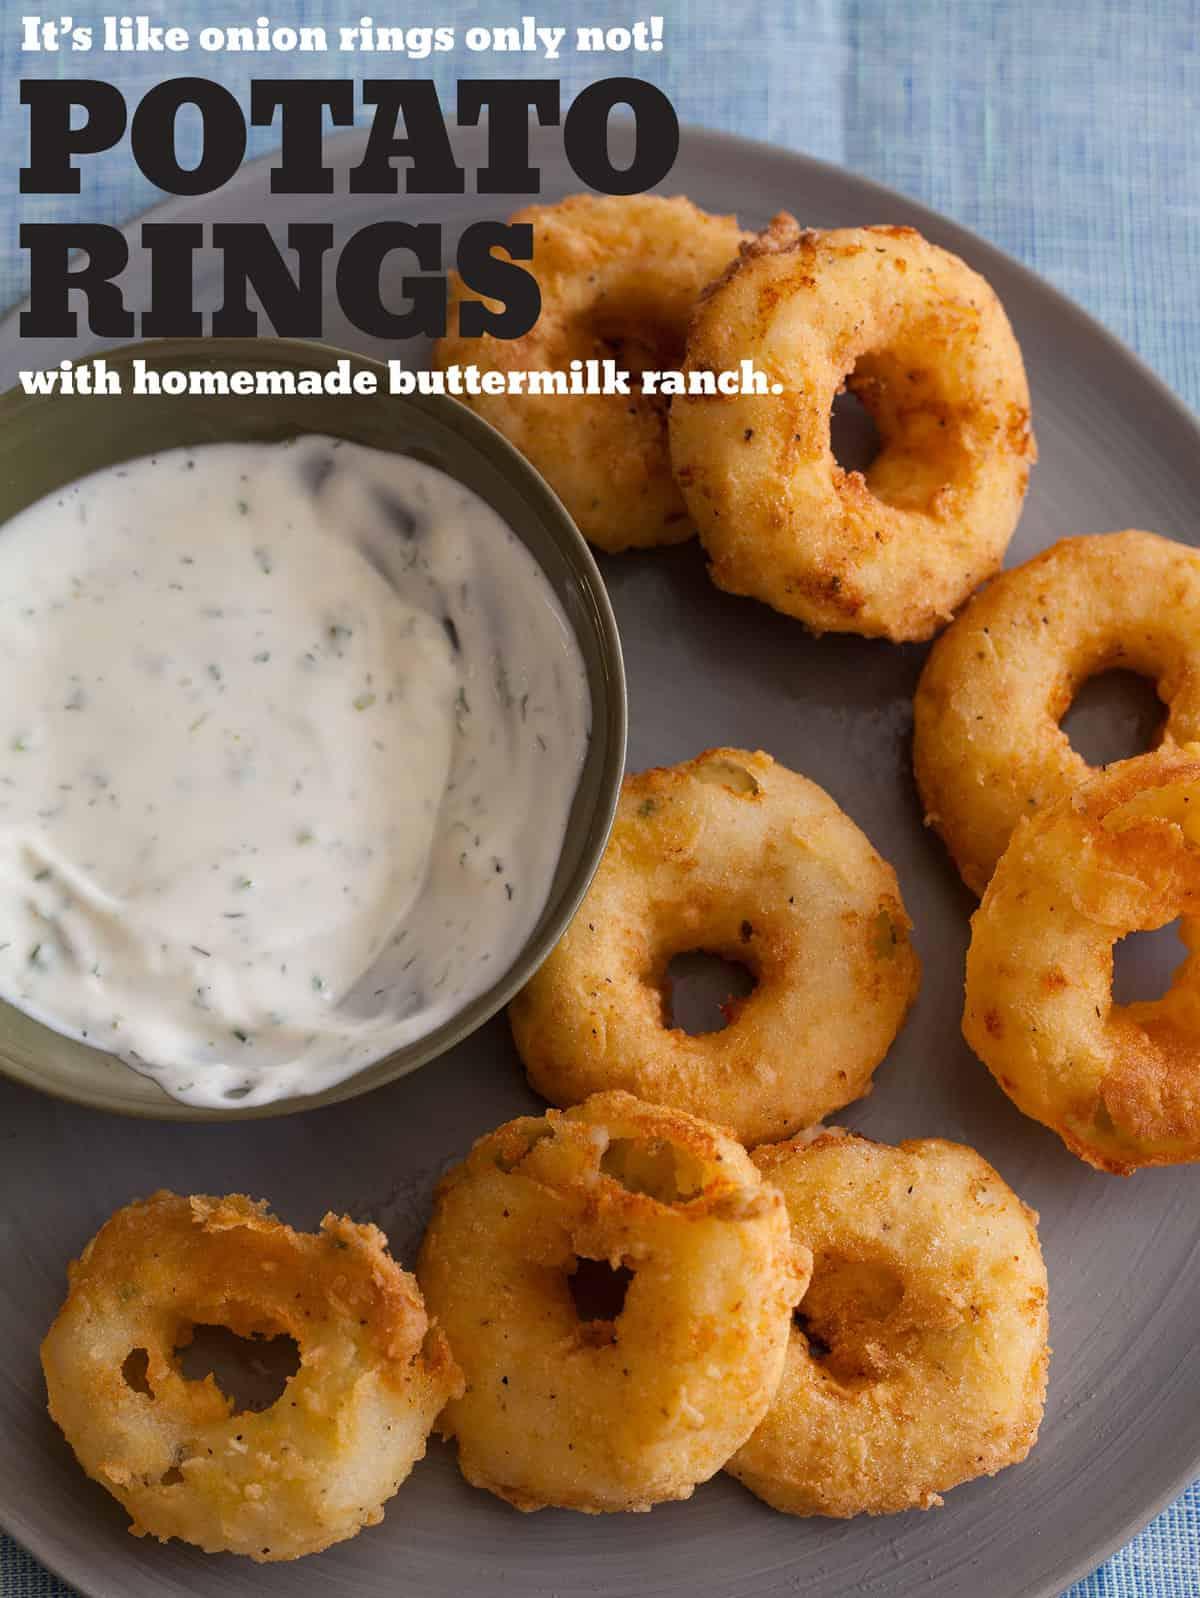 Potato Rings with Homemade Buttermilk Ranch | Spoon Fork Bacon